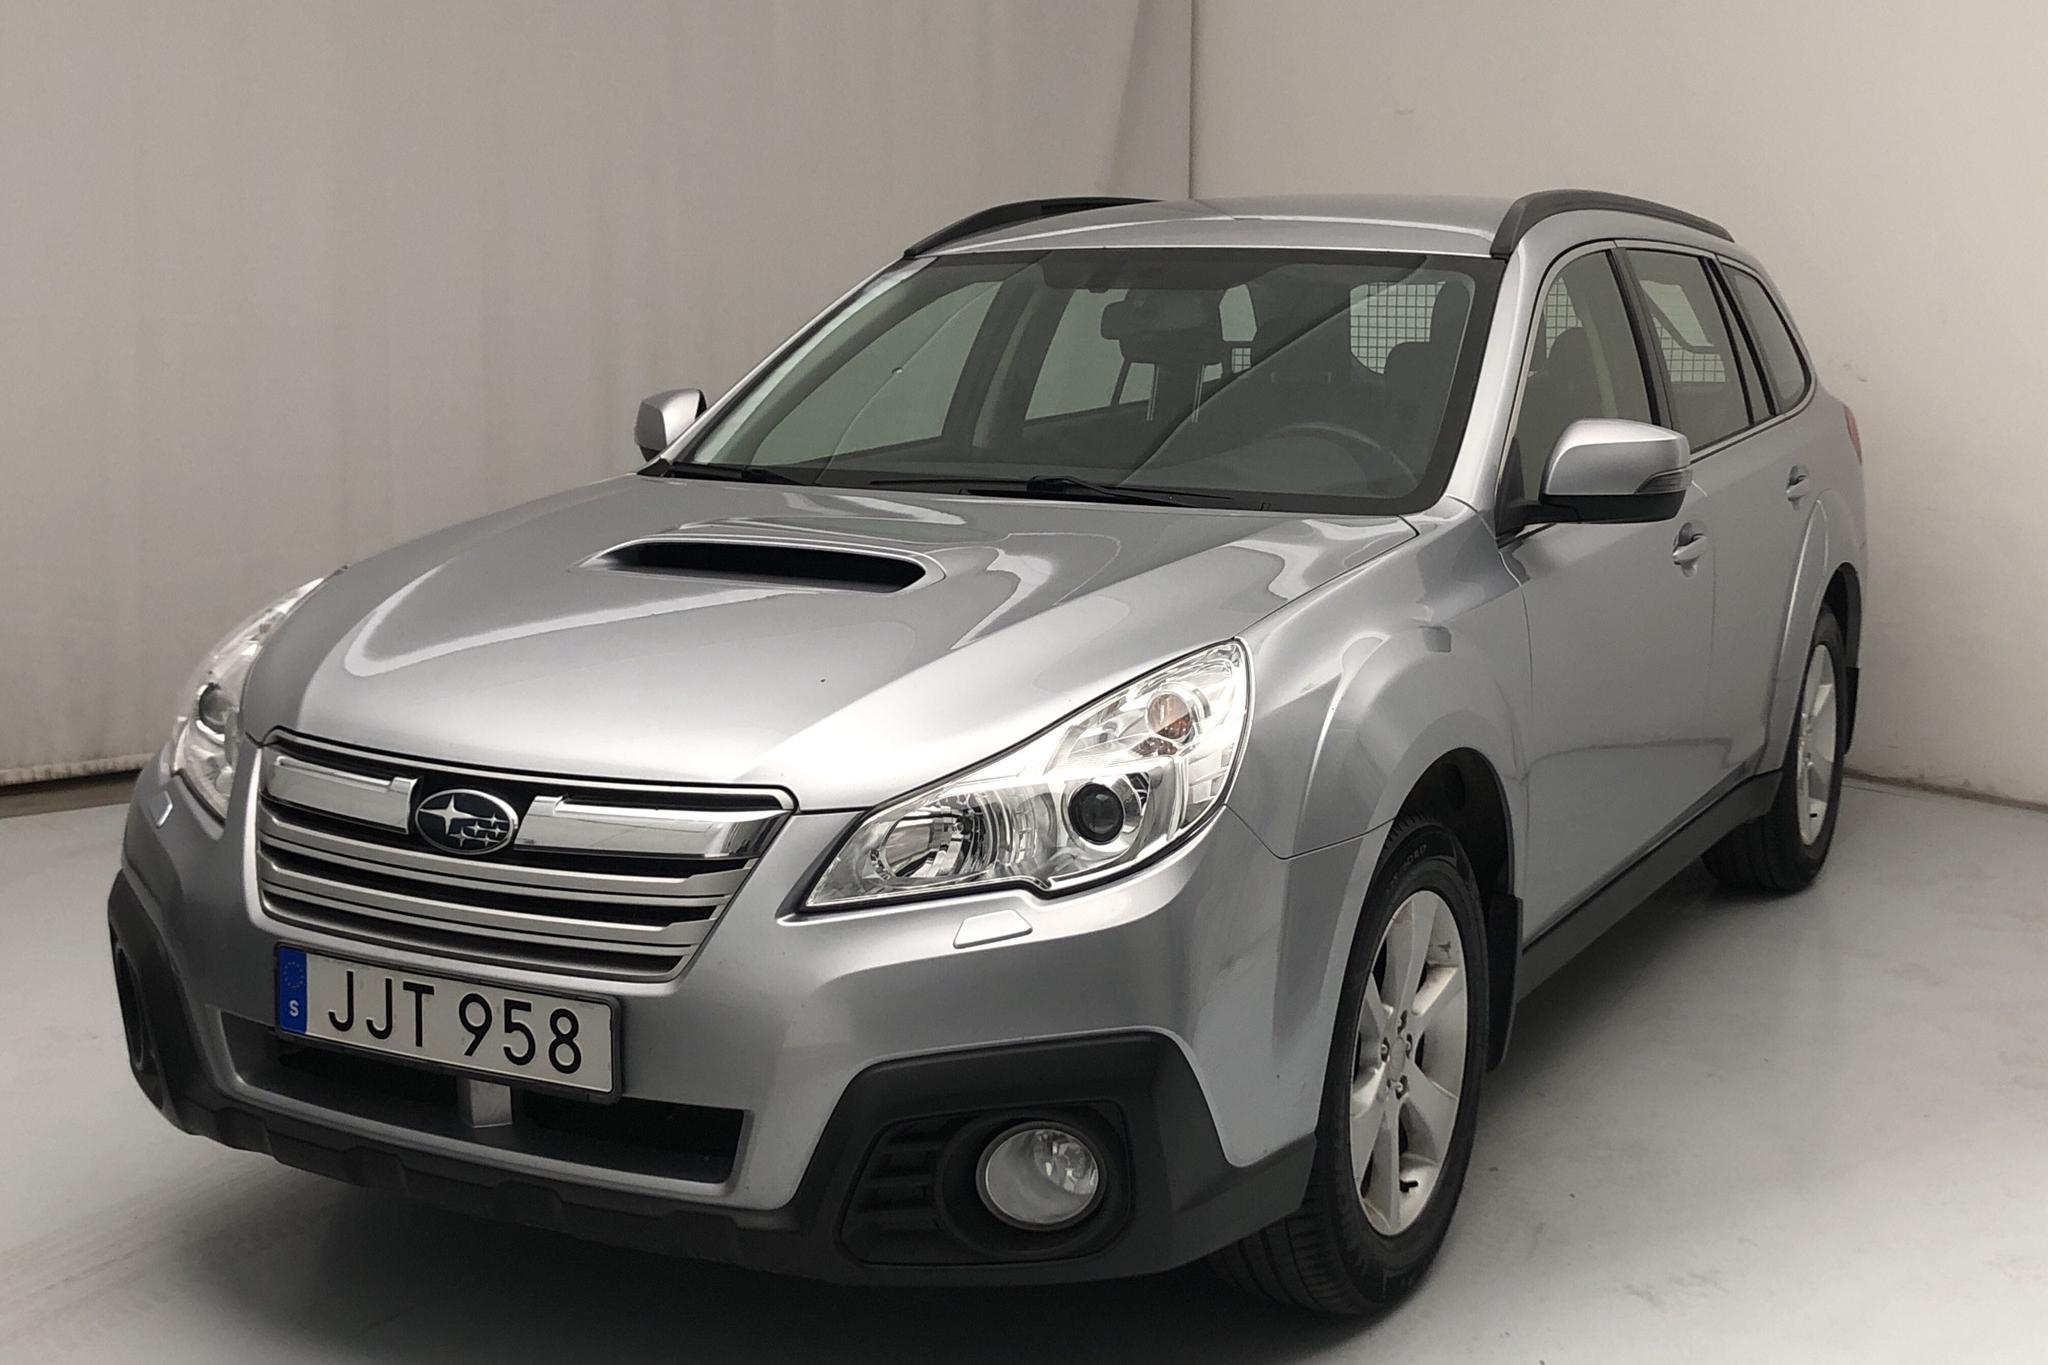 Subaru Outback 2.0D (150hk) - 18 925 mil - Manuell - silver - 2014